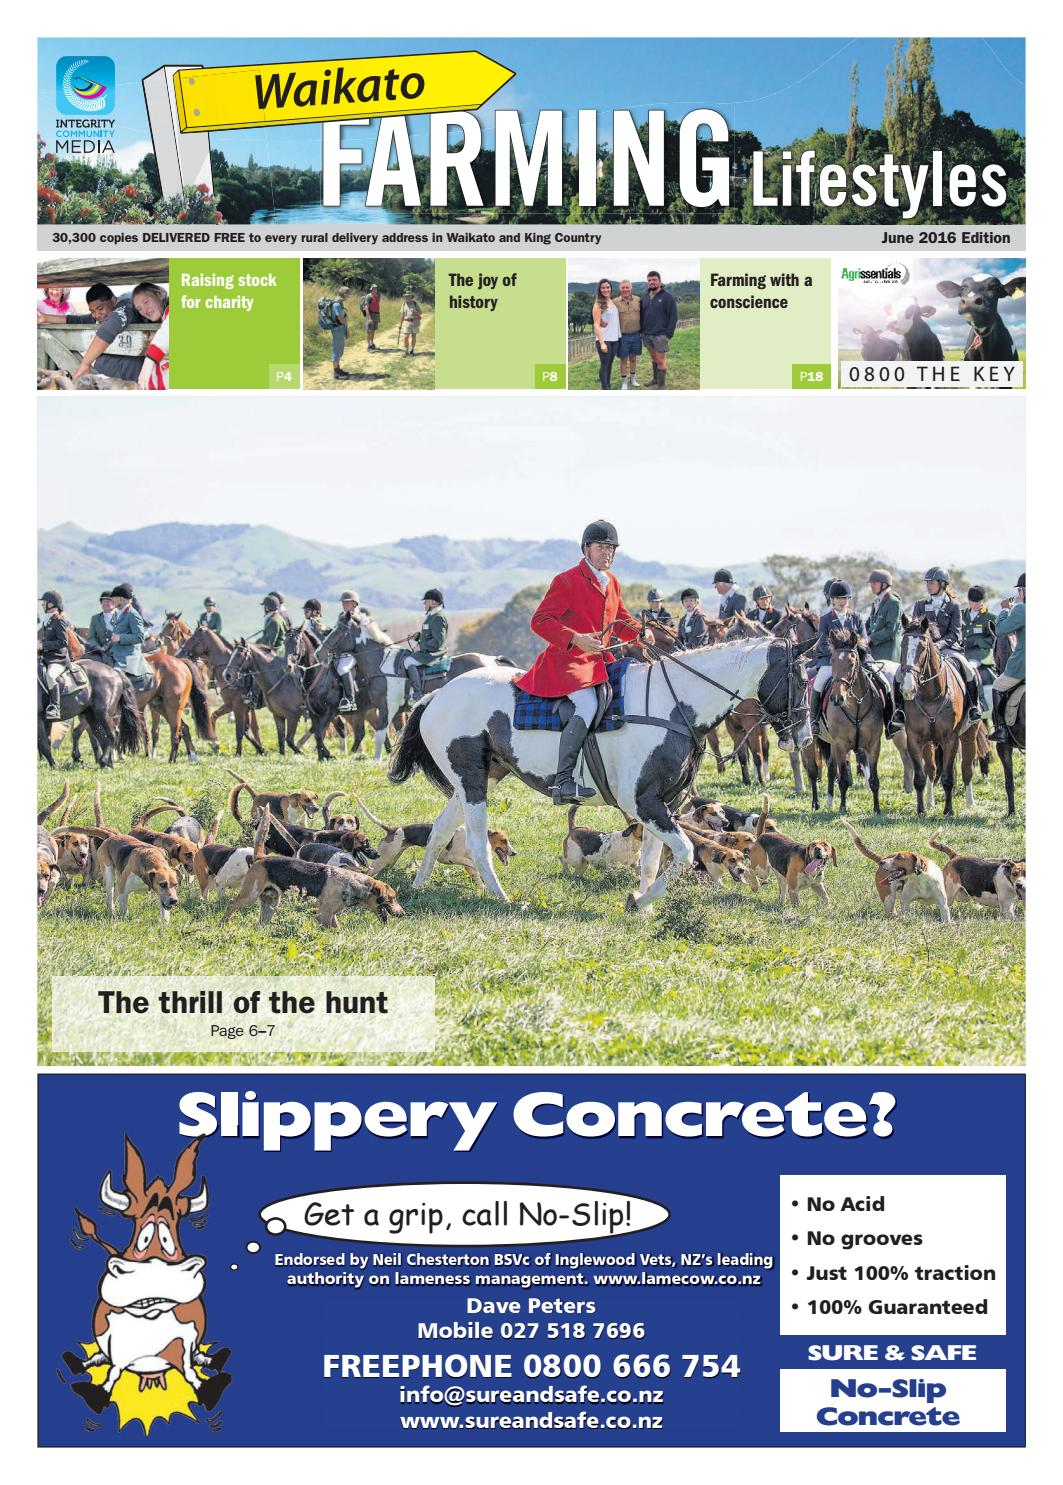 Waikato Farming Lifestyles, June 2016 by NorthSouth Multi Media Ltd - issuu